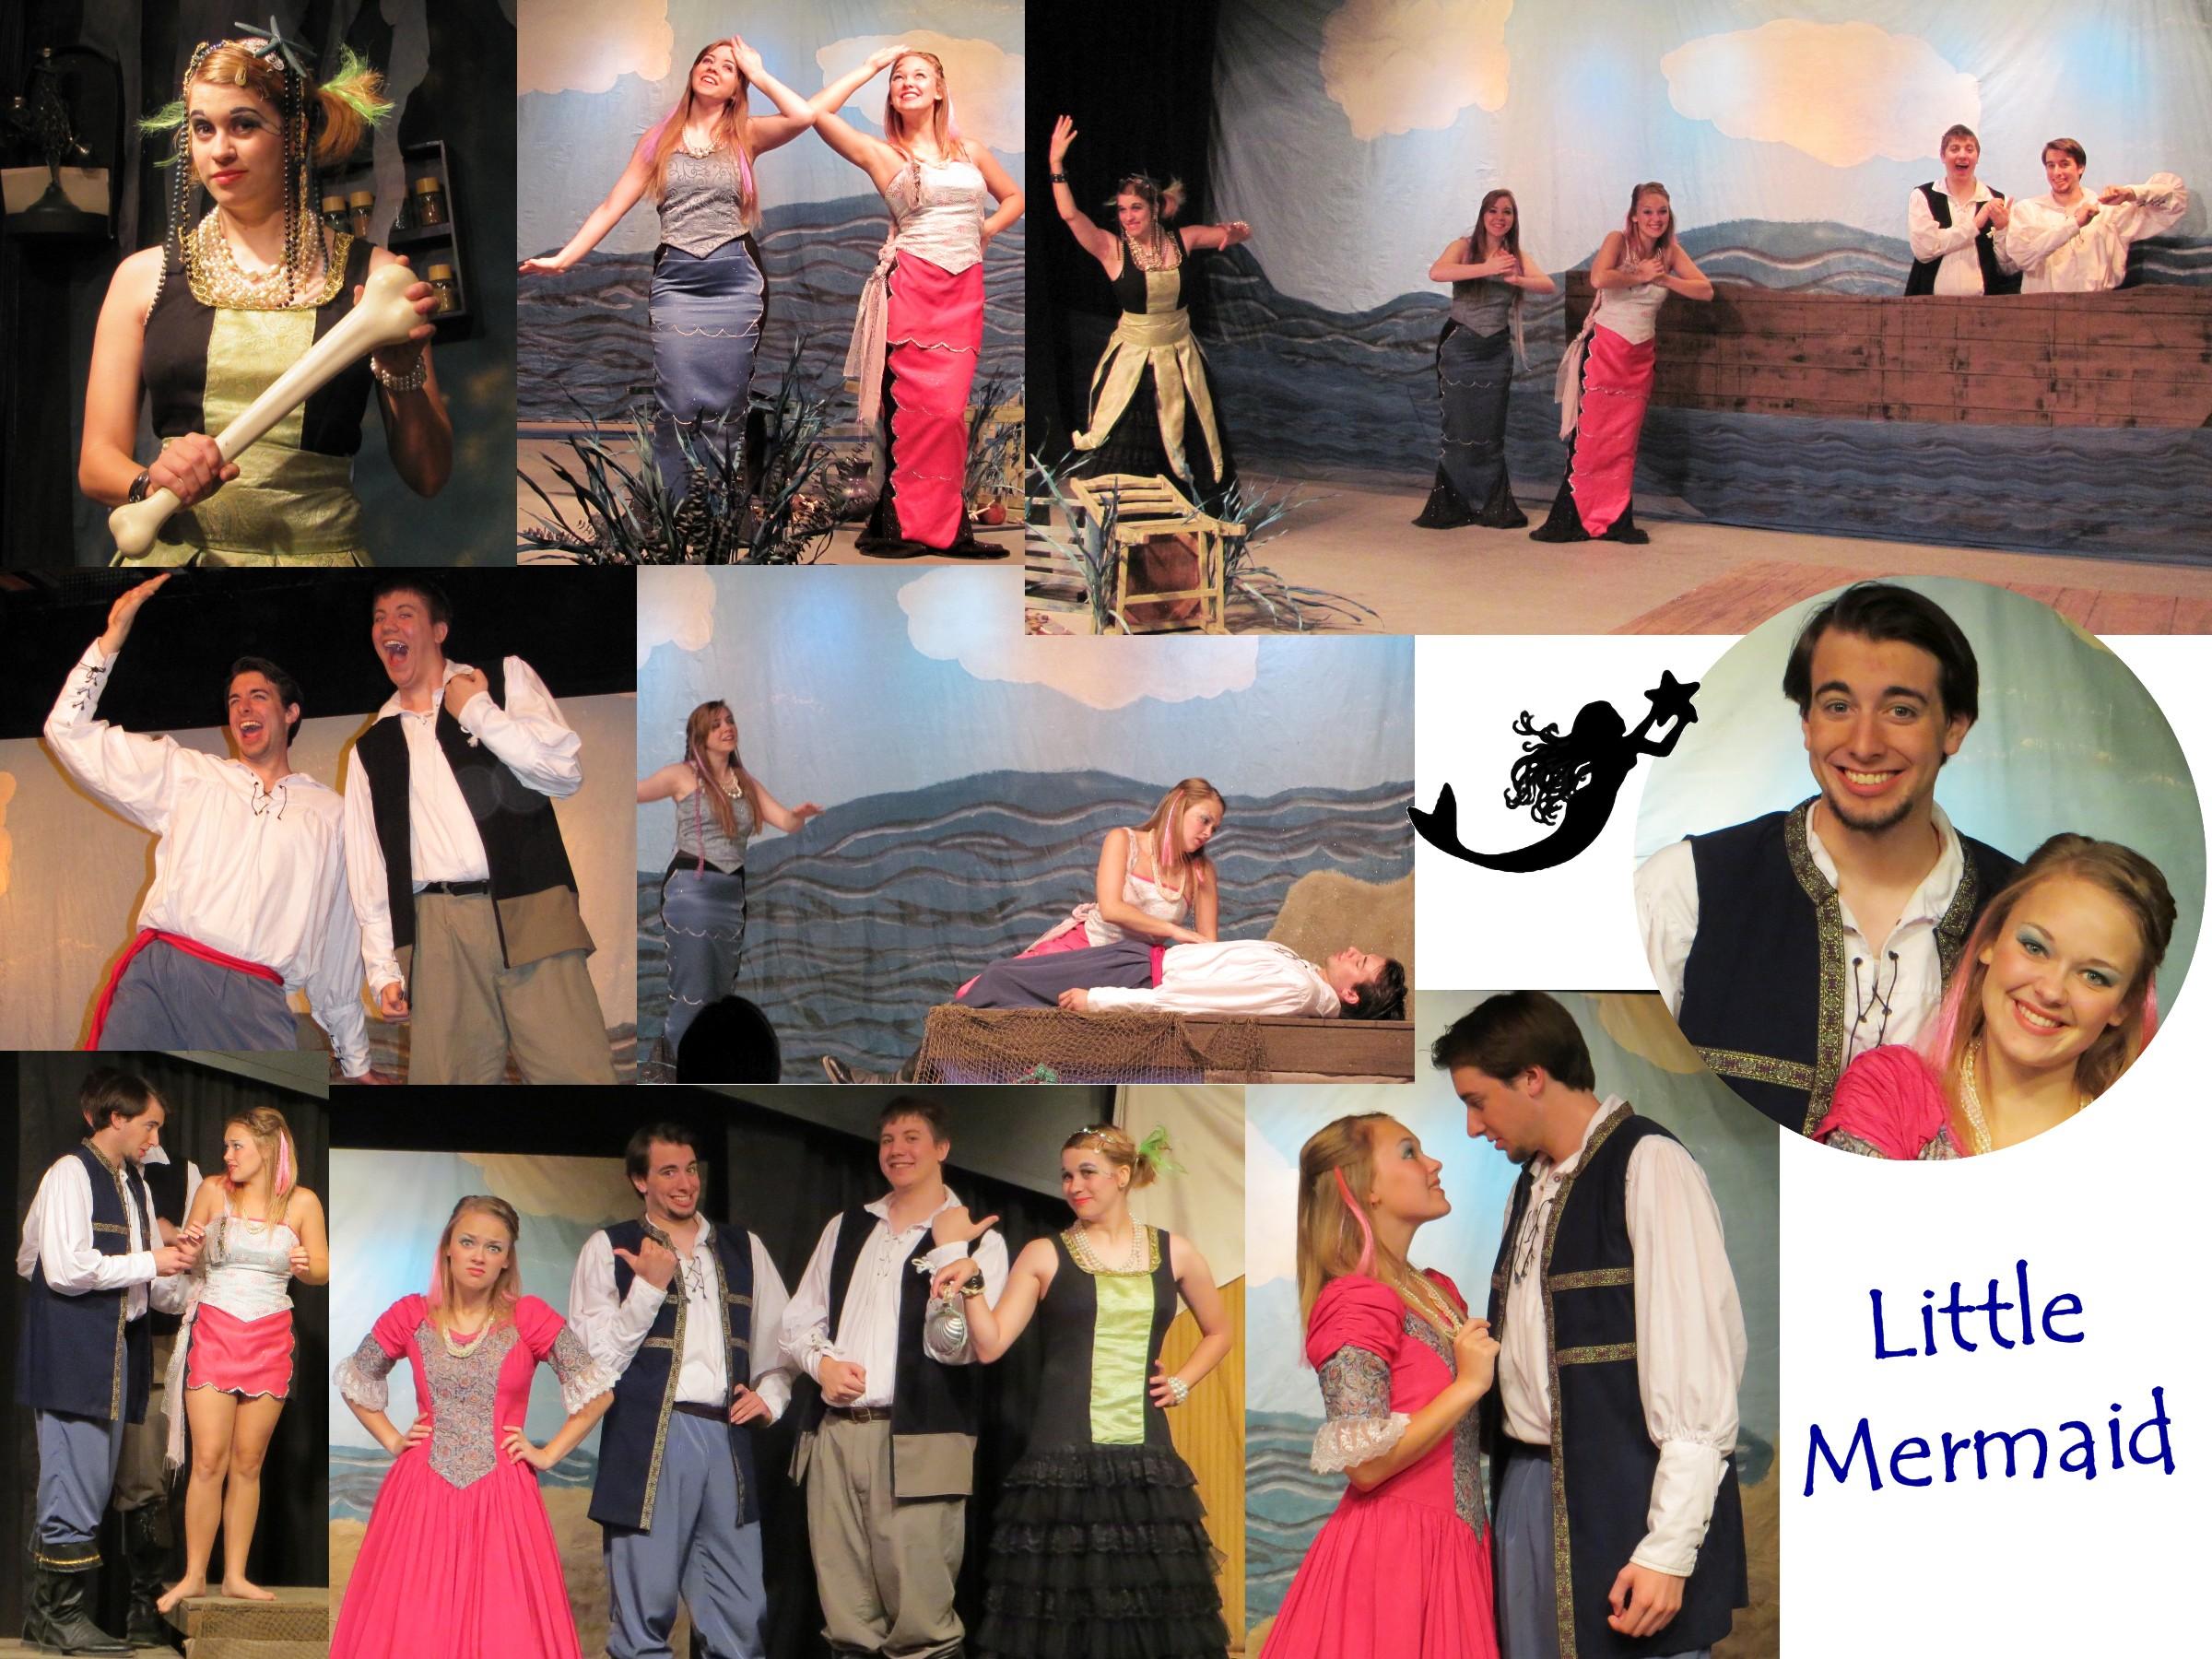 2012 The Little Mermaid